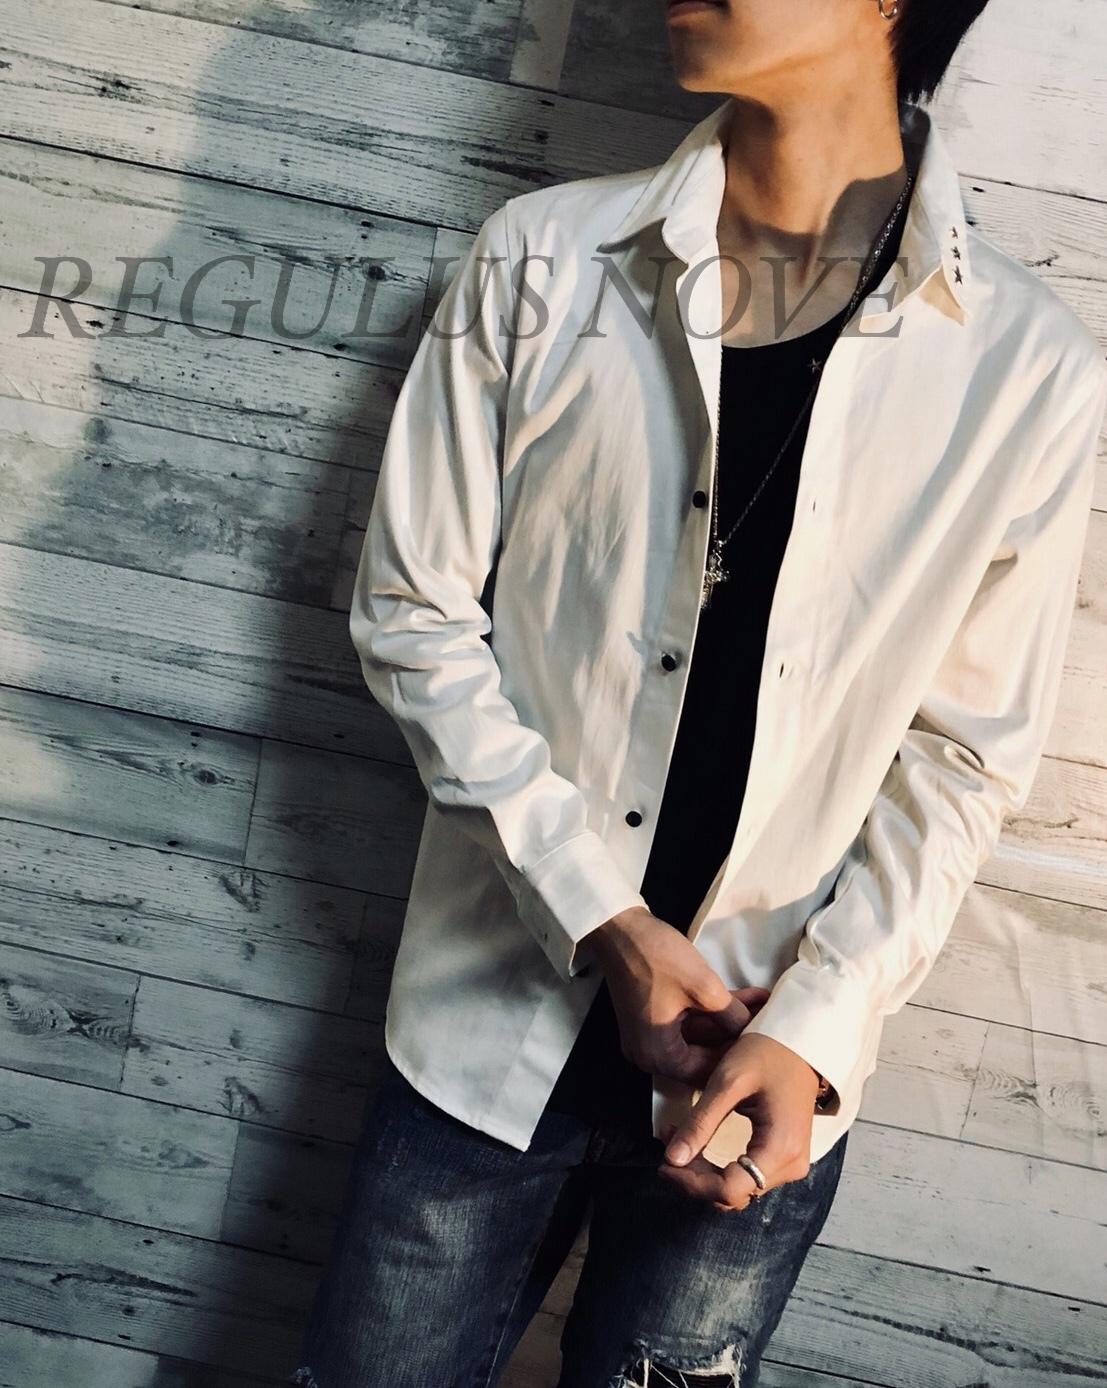 REGULUS NOVE ポイントスターストレッチブロードシャツ WHITE メンズ 男物 紳士服 細身 フォーマル カジュアル 星 スタッズ トップス